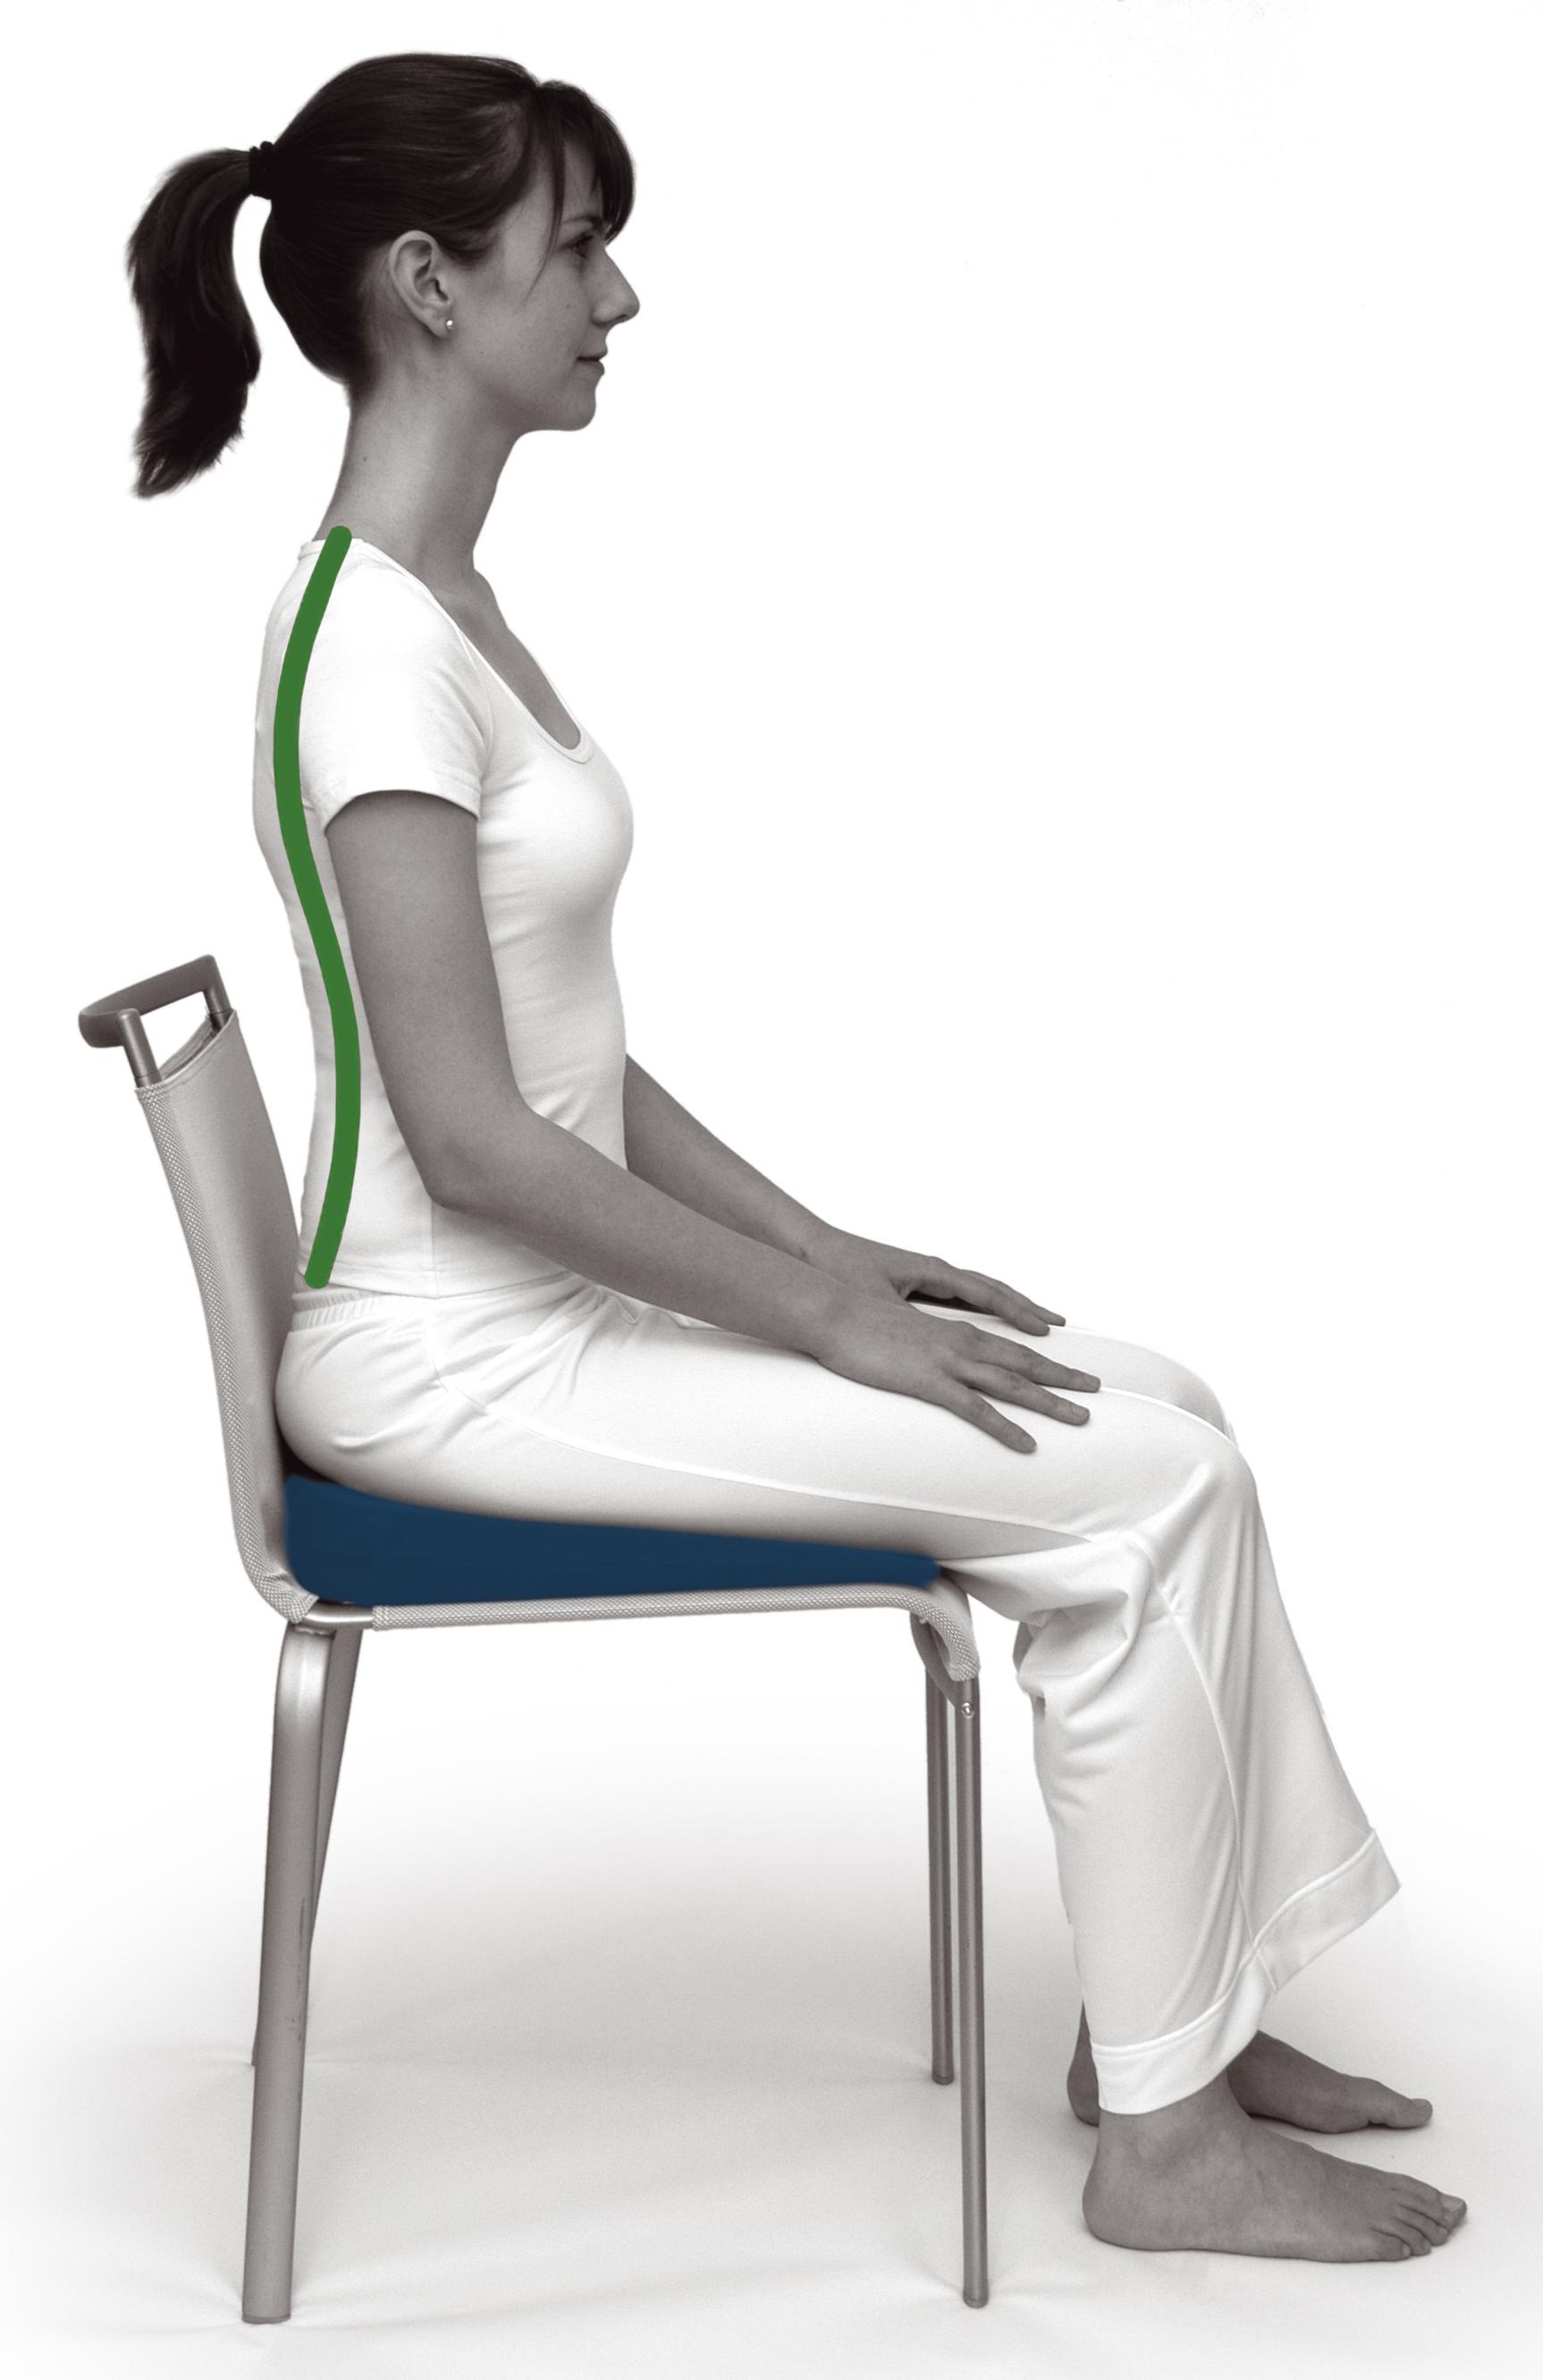 Sit_richtig.jpg